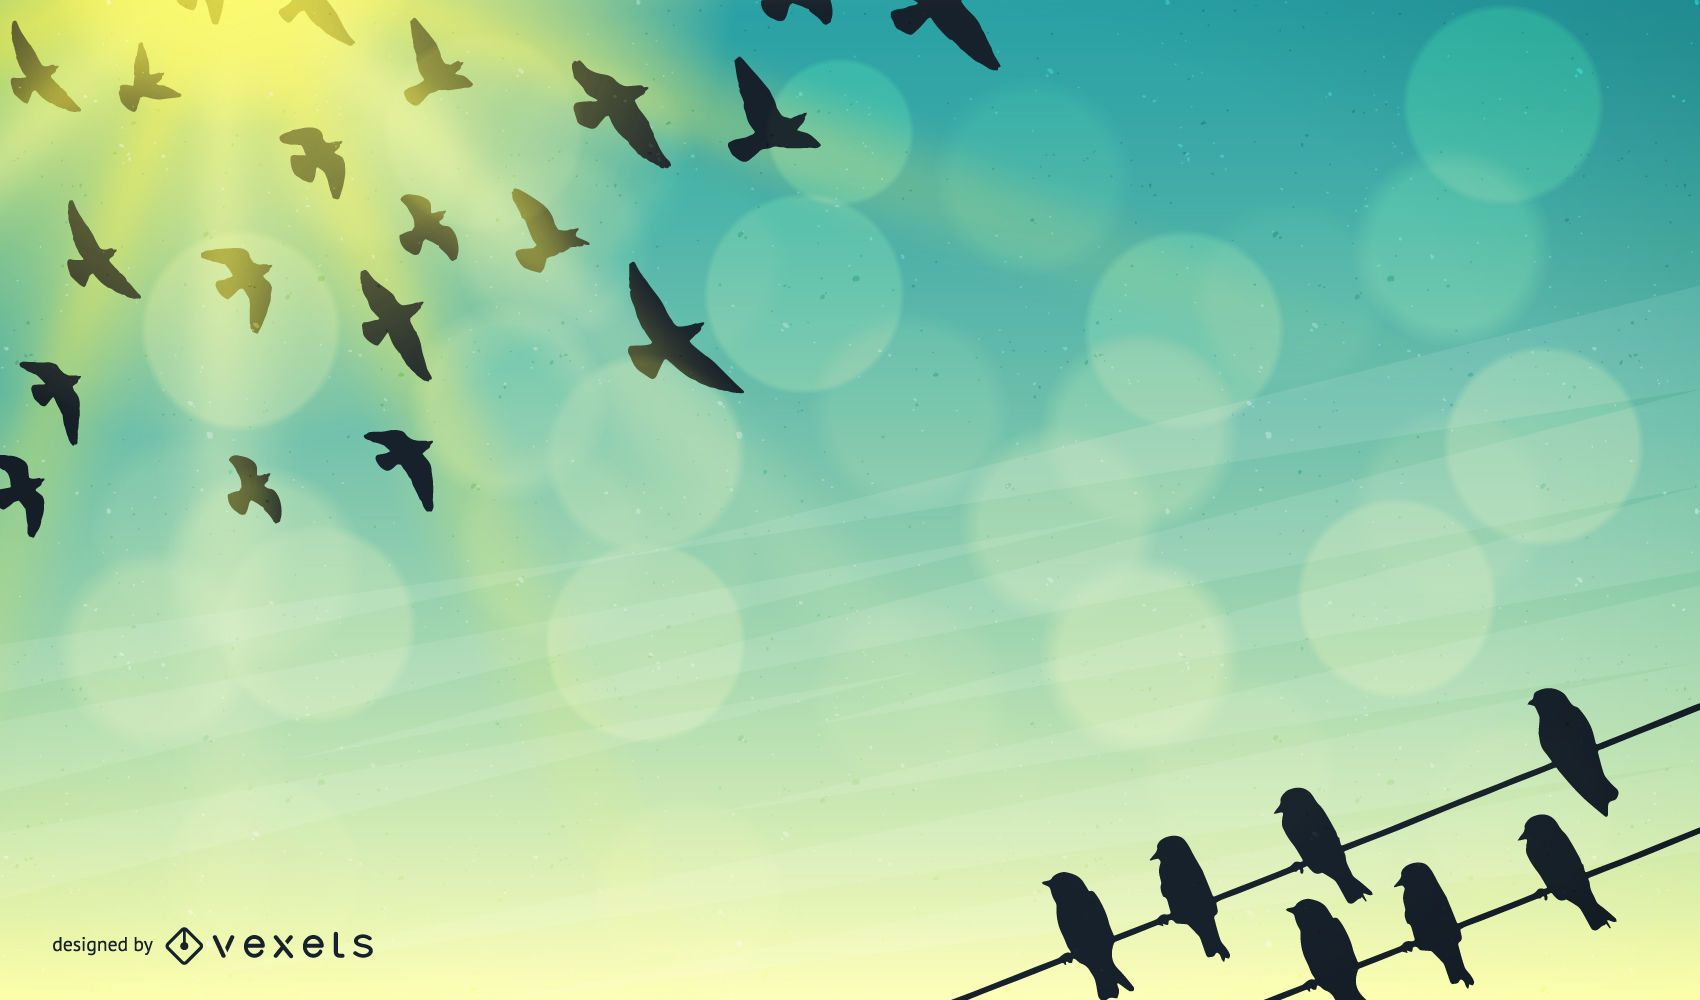 Sky illustration with birds